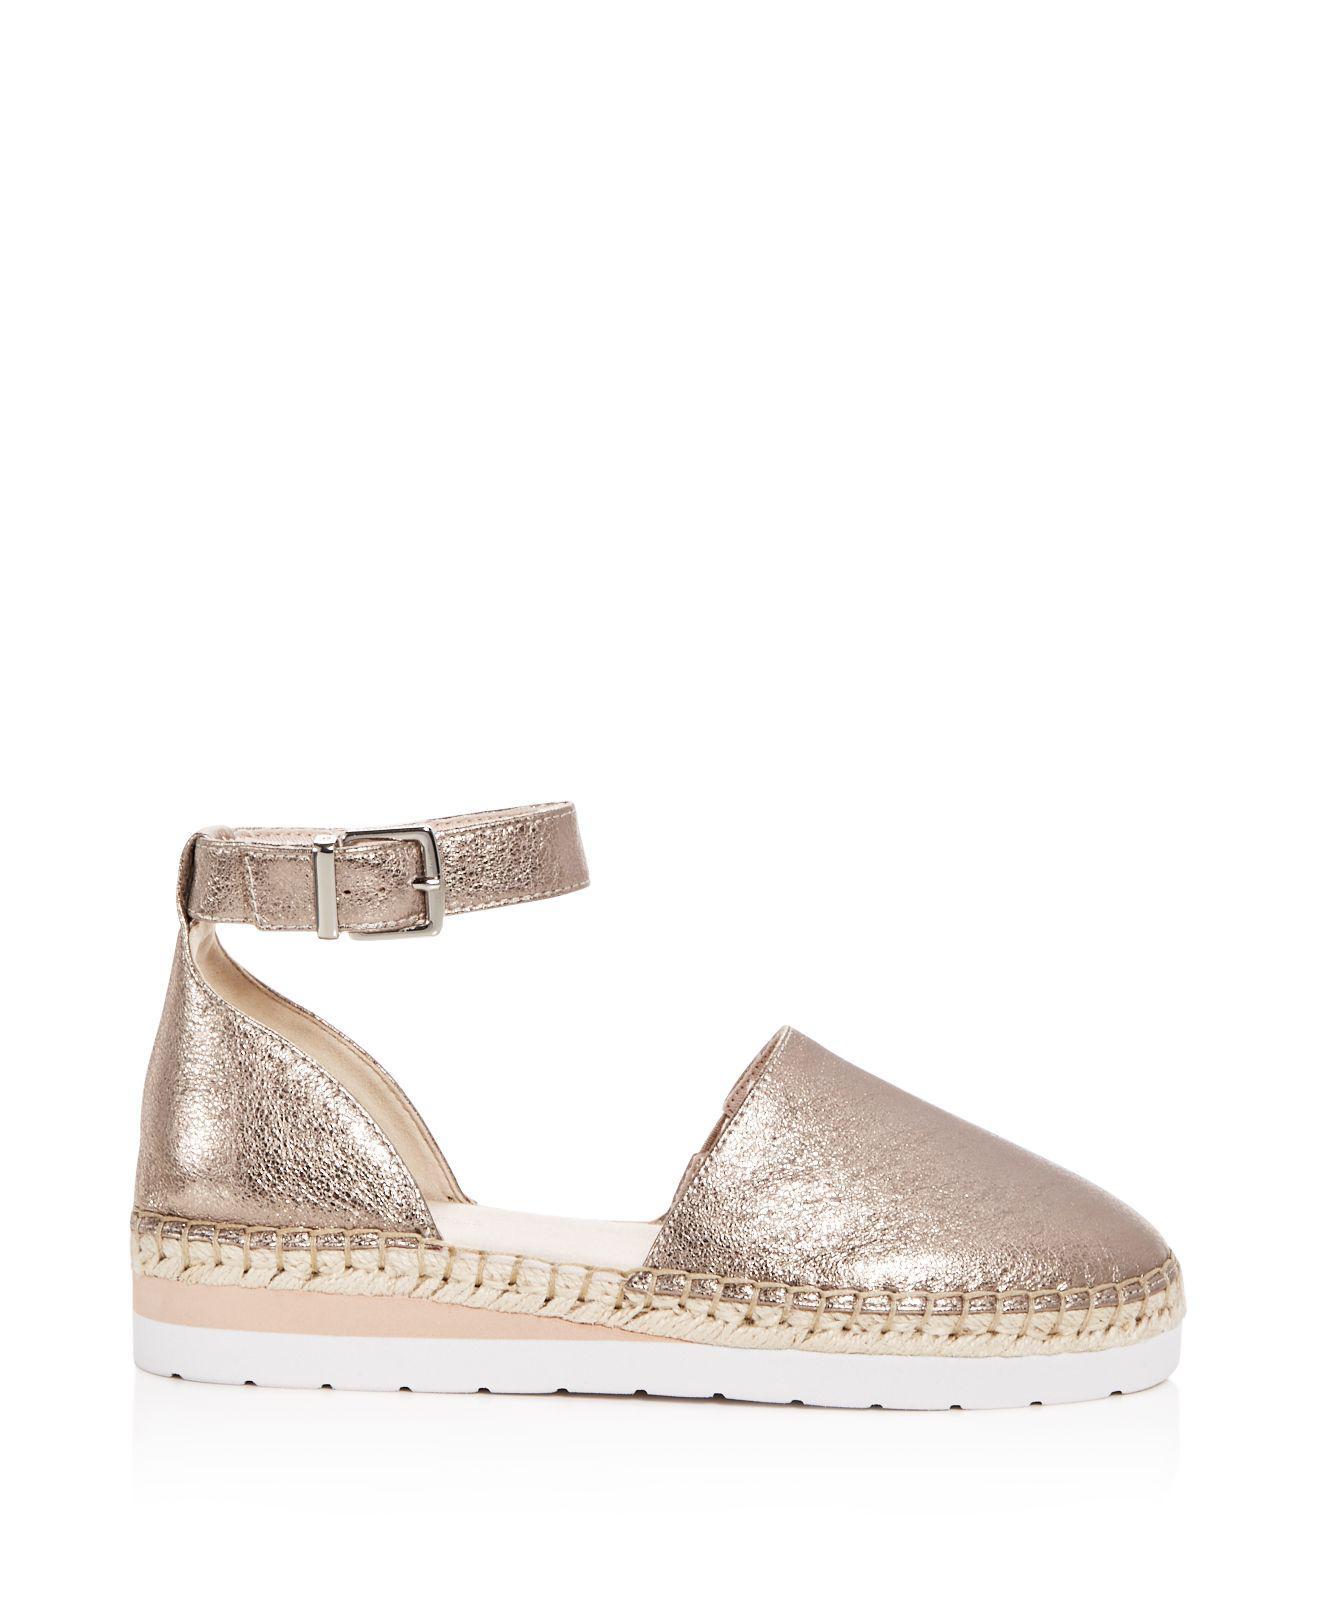 Visit Original Online Kenneth Cole Women's Babbot Leather d'Orsay Espadrille Platform Sandals Huge Surprise Cheap Online YBA2M0p